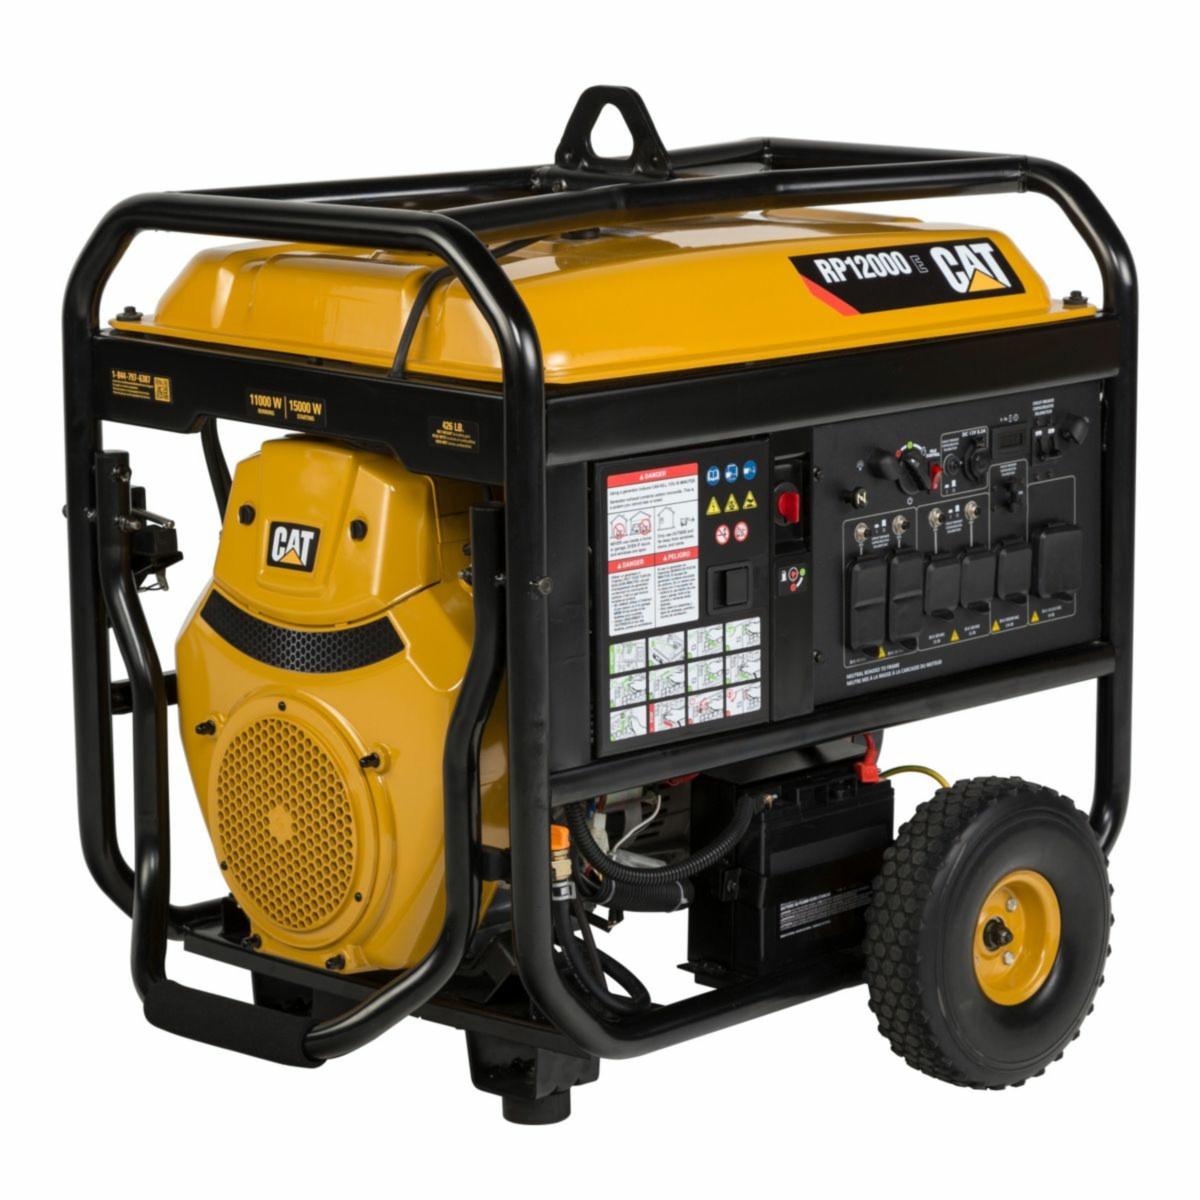 cat rp12000e 12000w electric start portable generator generac gp5500 carburetor carb compliant portable generators